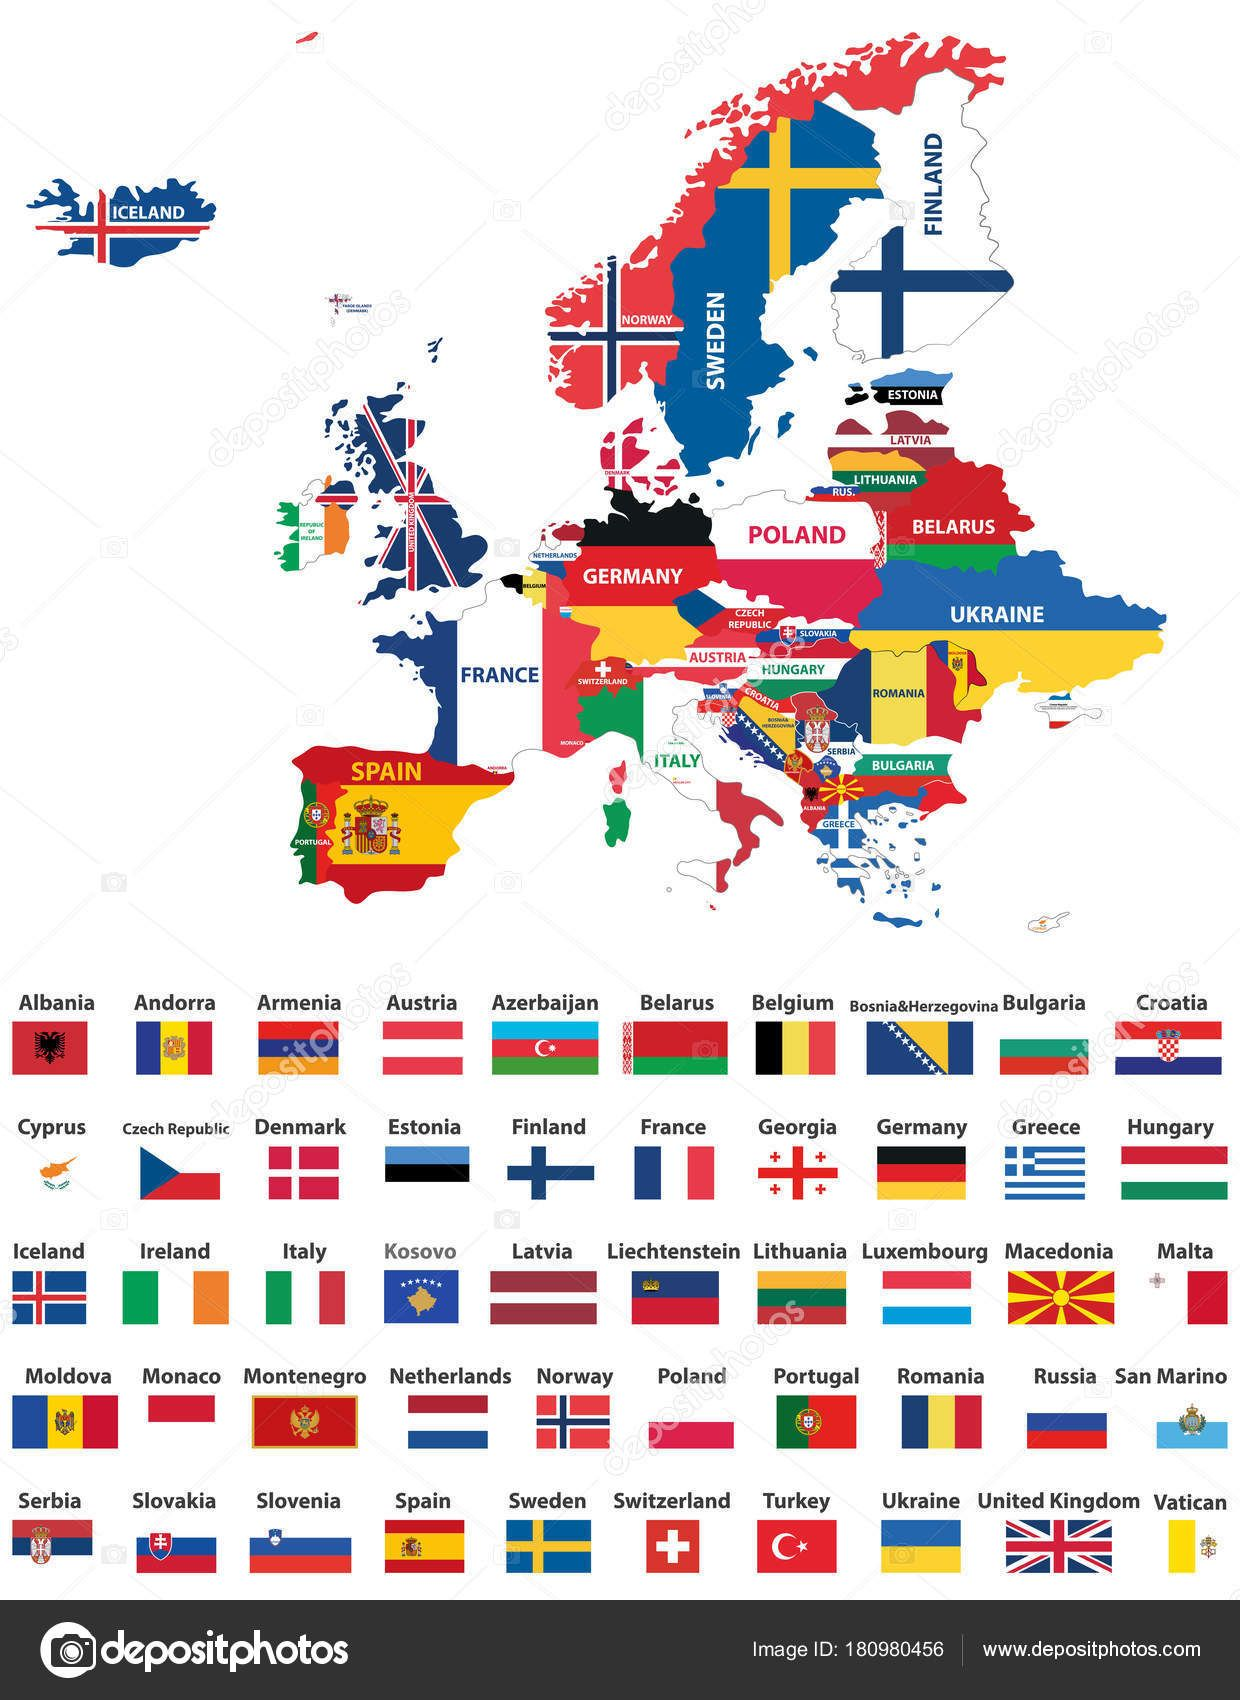 Pin Von Hana Fortova Auf Cizi Zeme In 2020 Mit Bildern Europa